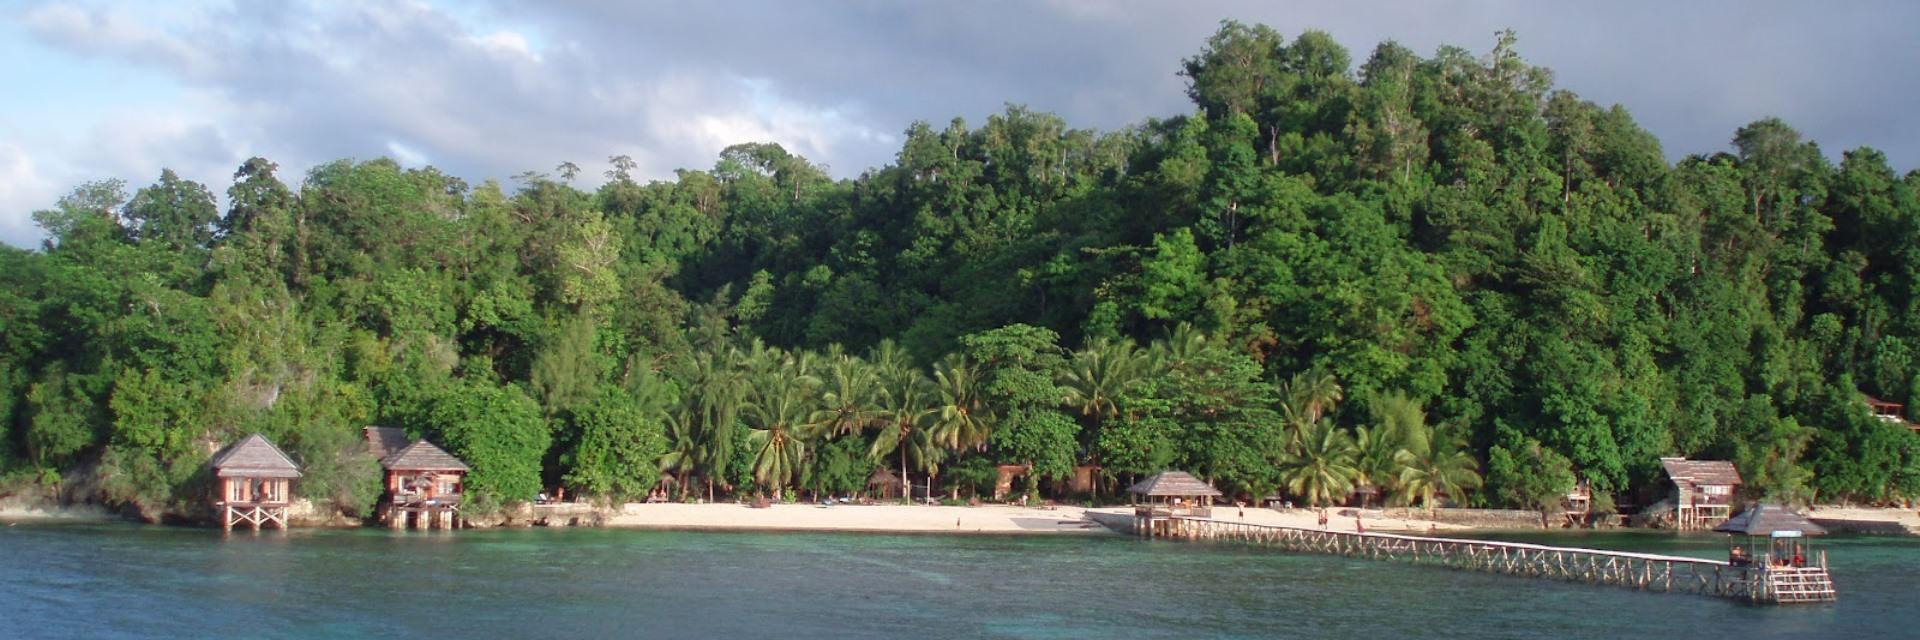 Pulau Kadidiri Maldives Taman Nasional Togean Pulau Kadidiri Maldives Taman Nasional Togean - Dolan Dolen